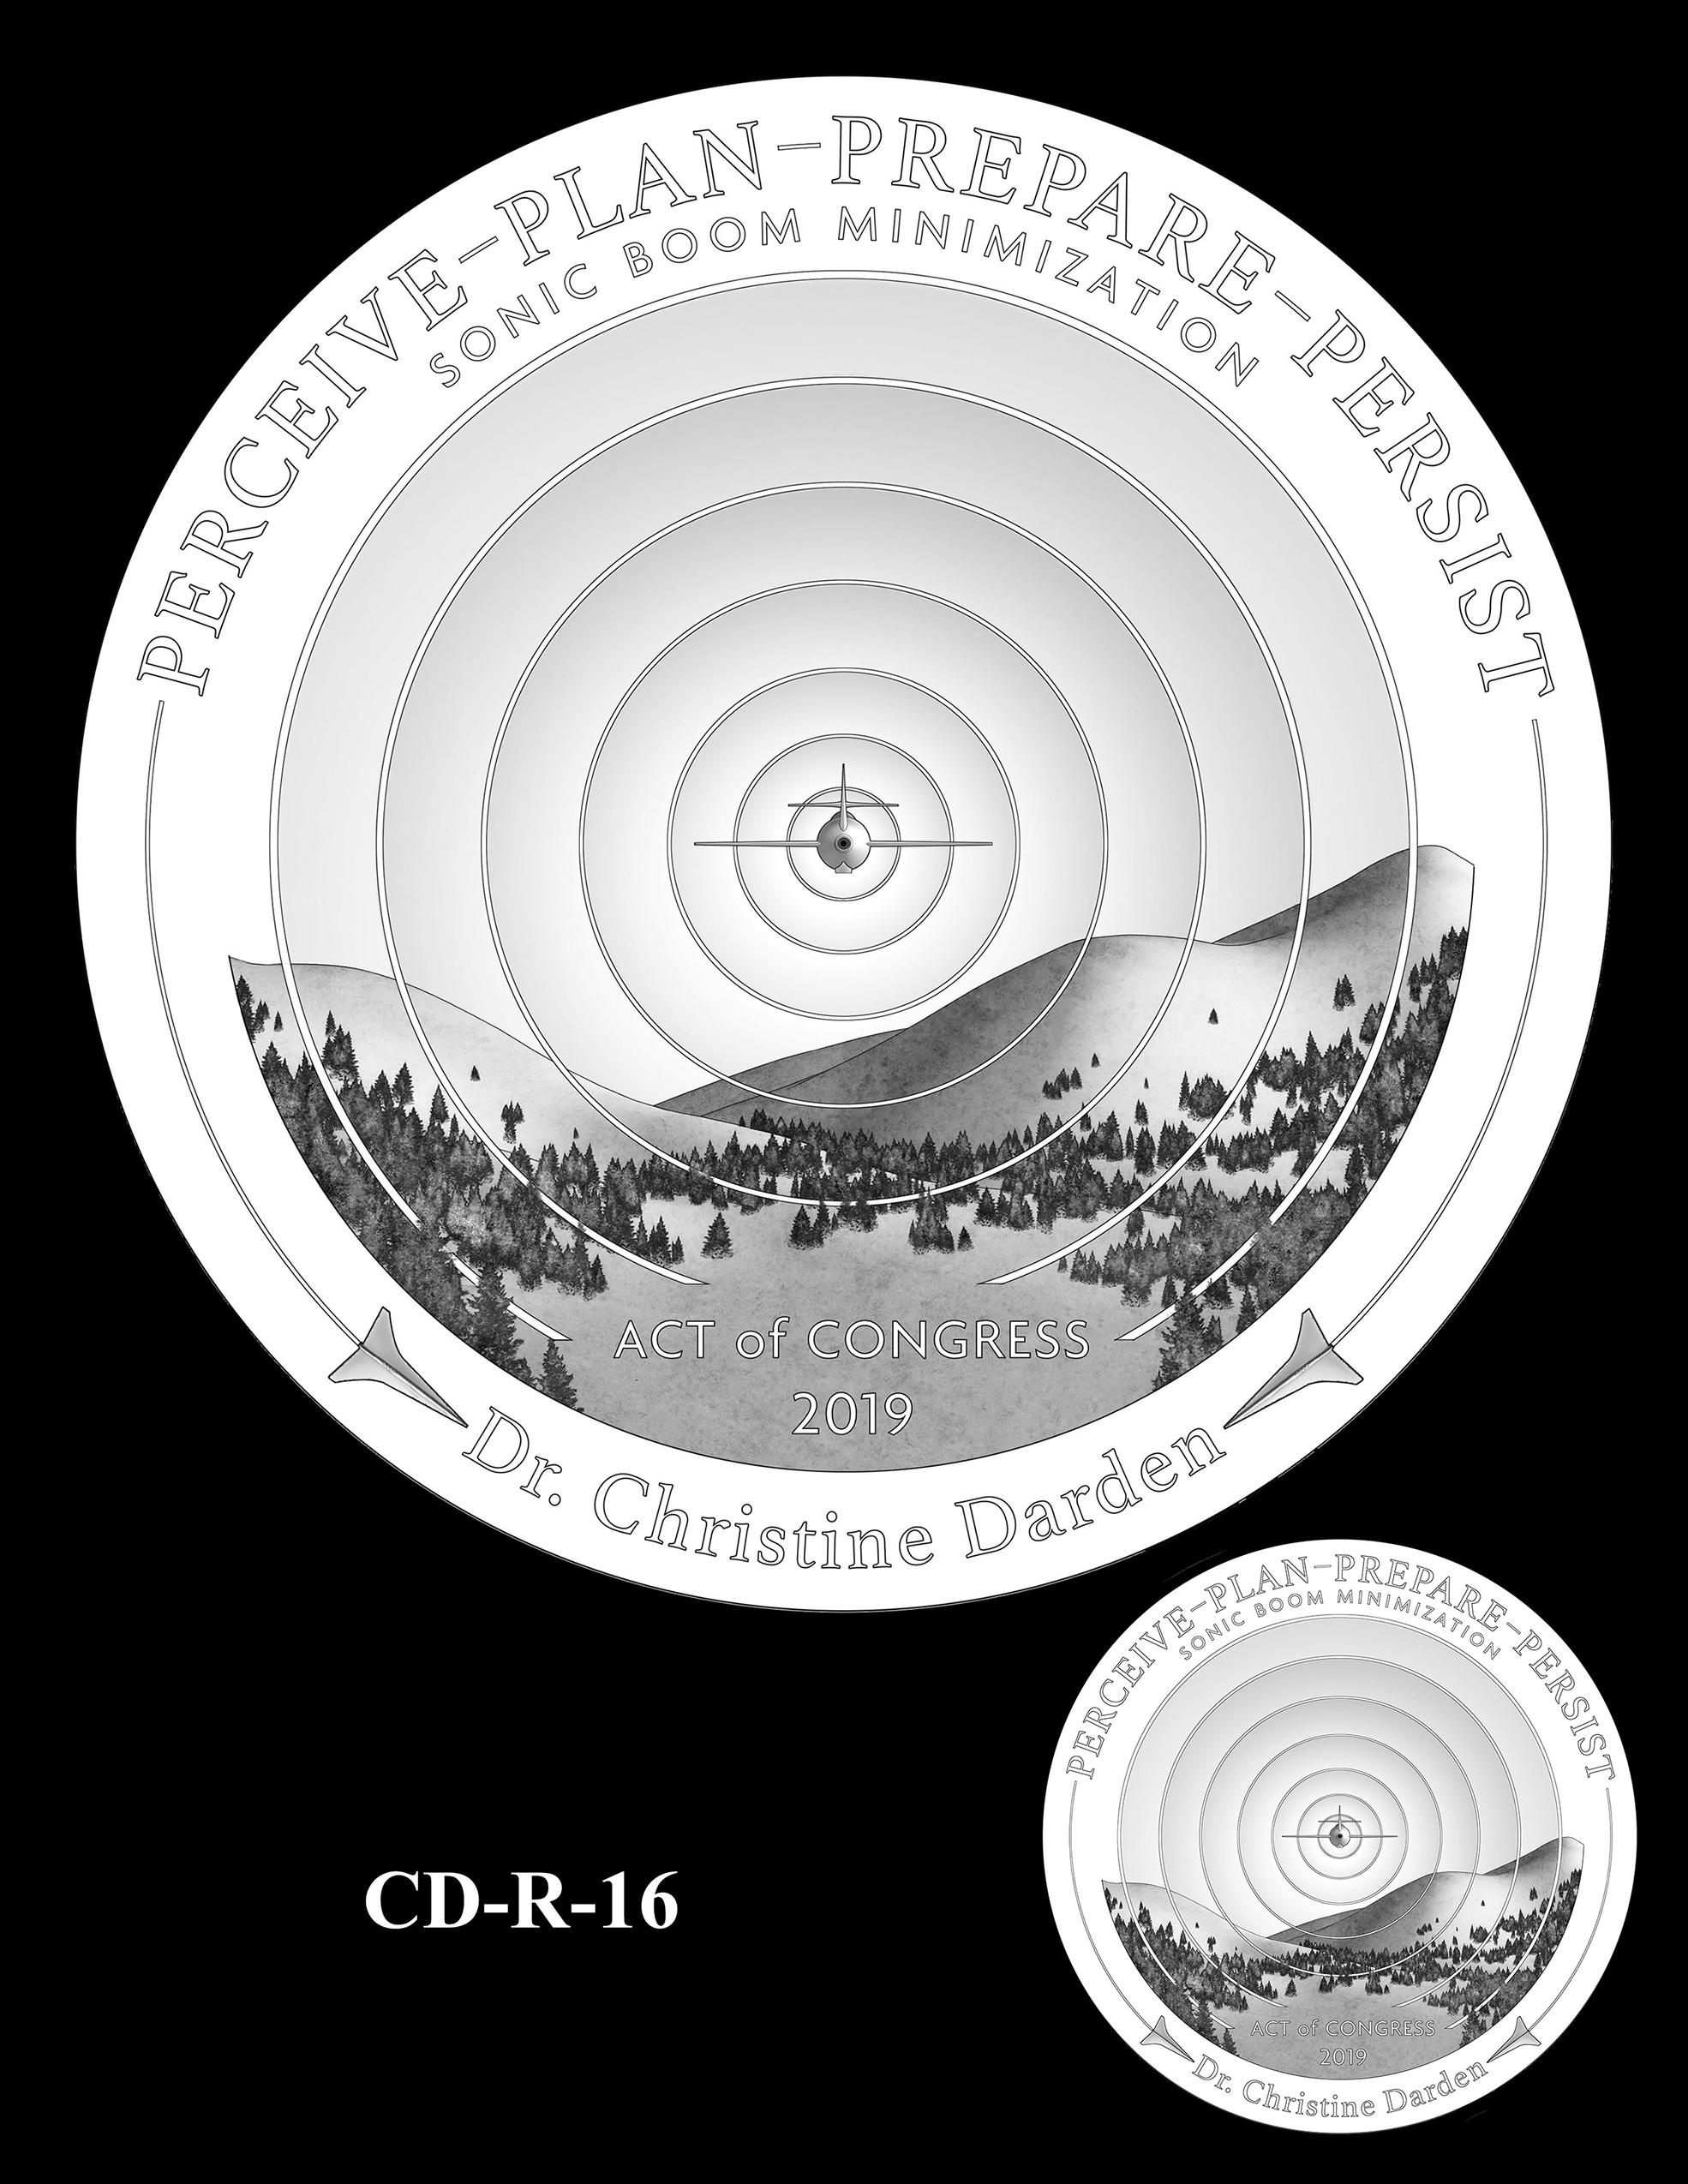 CD-R-16 -- Dr. Christine Darden Congressional Gold Medal